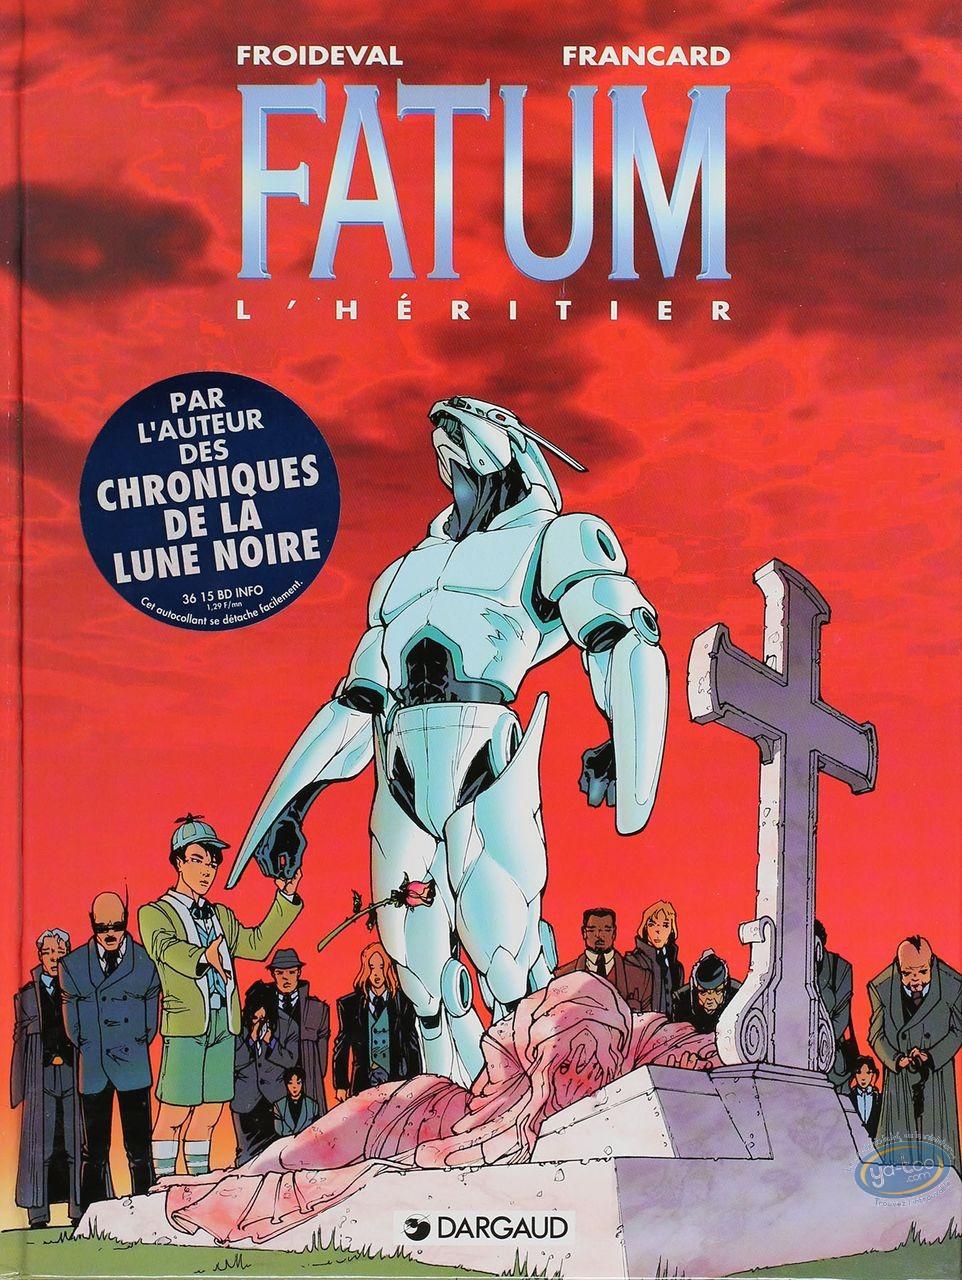 Listed European Comic Books, Fatum : L'Heritier (very good condition)